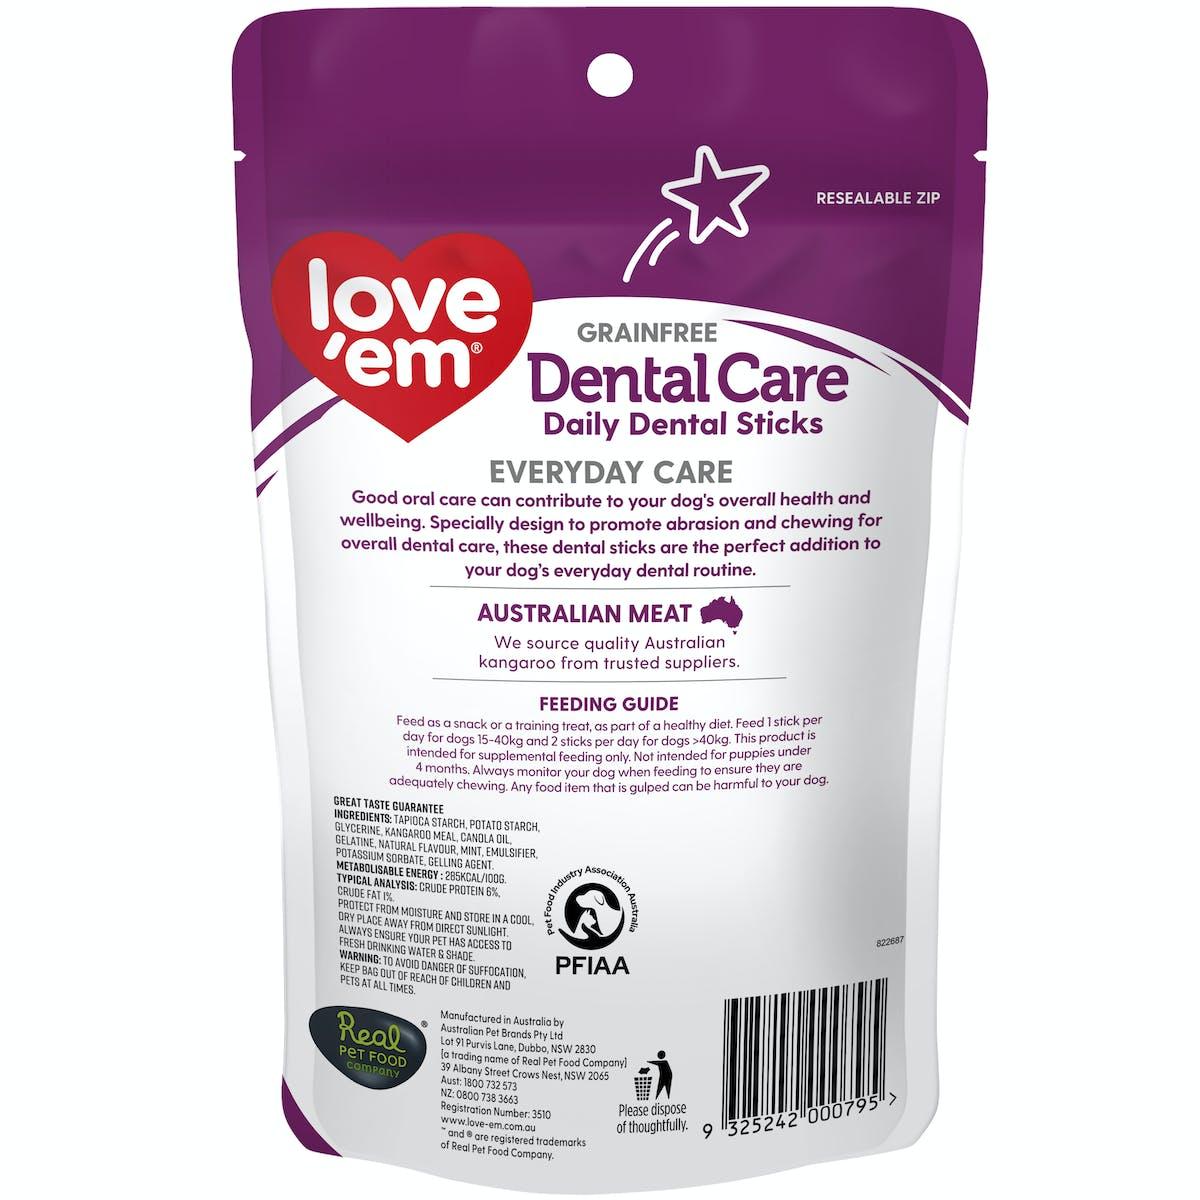 Love'em | Dental Care Daily Dental Sticks Medium - Large | Dog treats | Front of pack